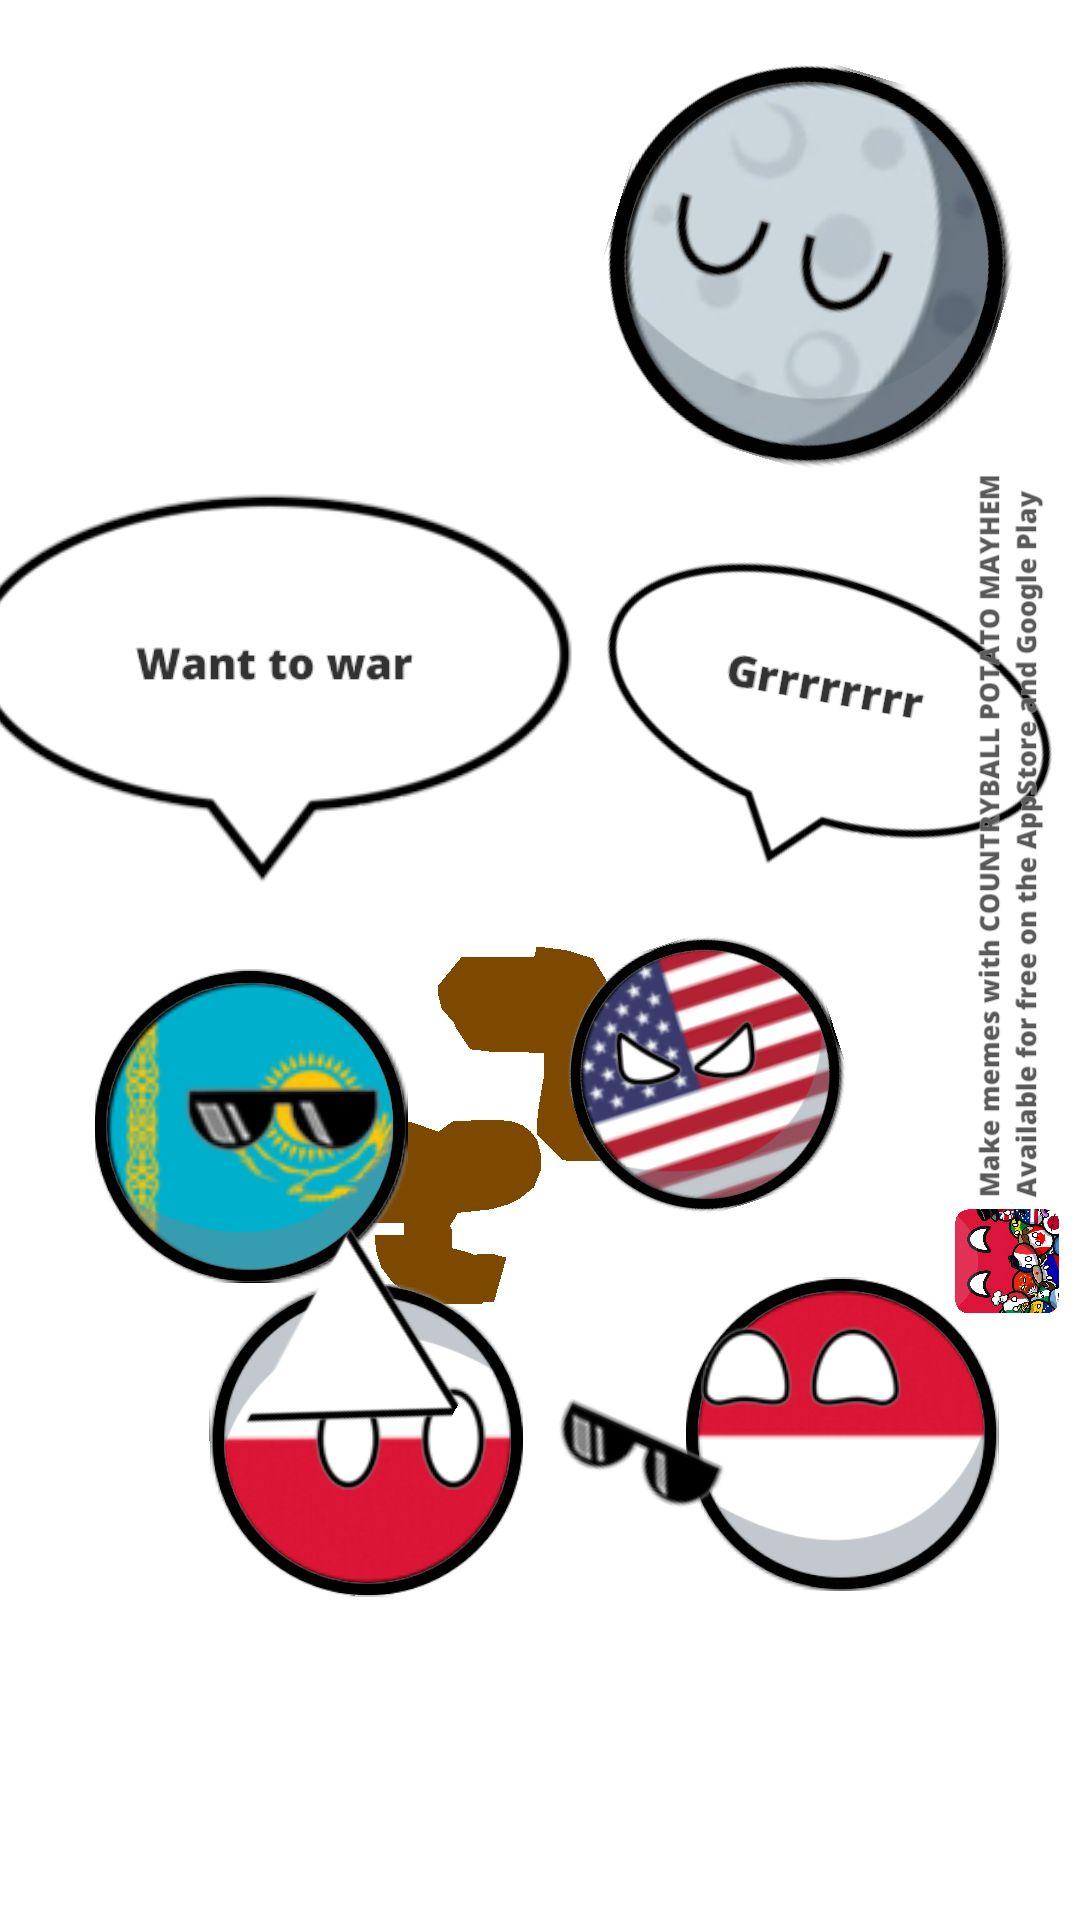 Download Countryball Potato Mayhem S Meme Creator For Free Appstore Https Itunes Apple Com Us App Countryball Id Meme Creator Google Play Store Google Play